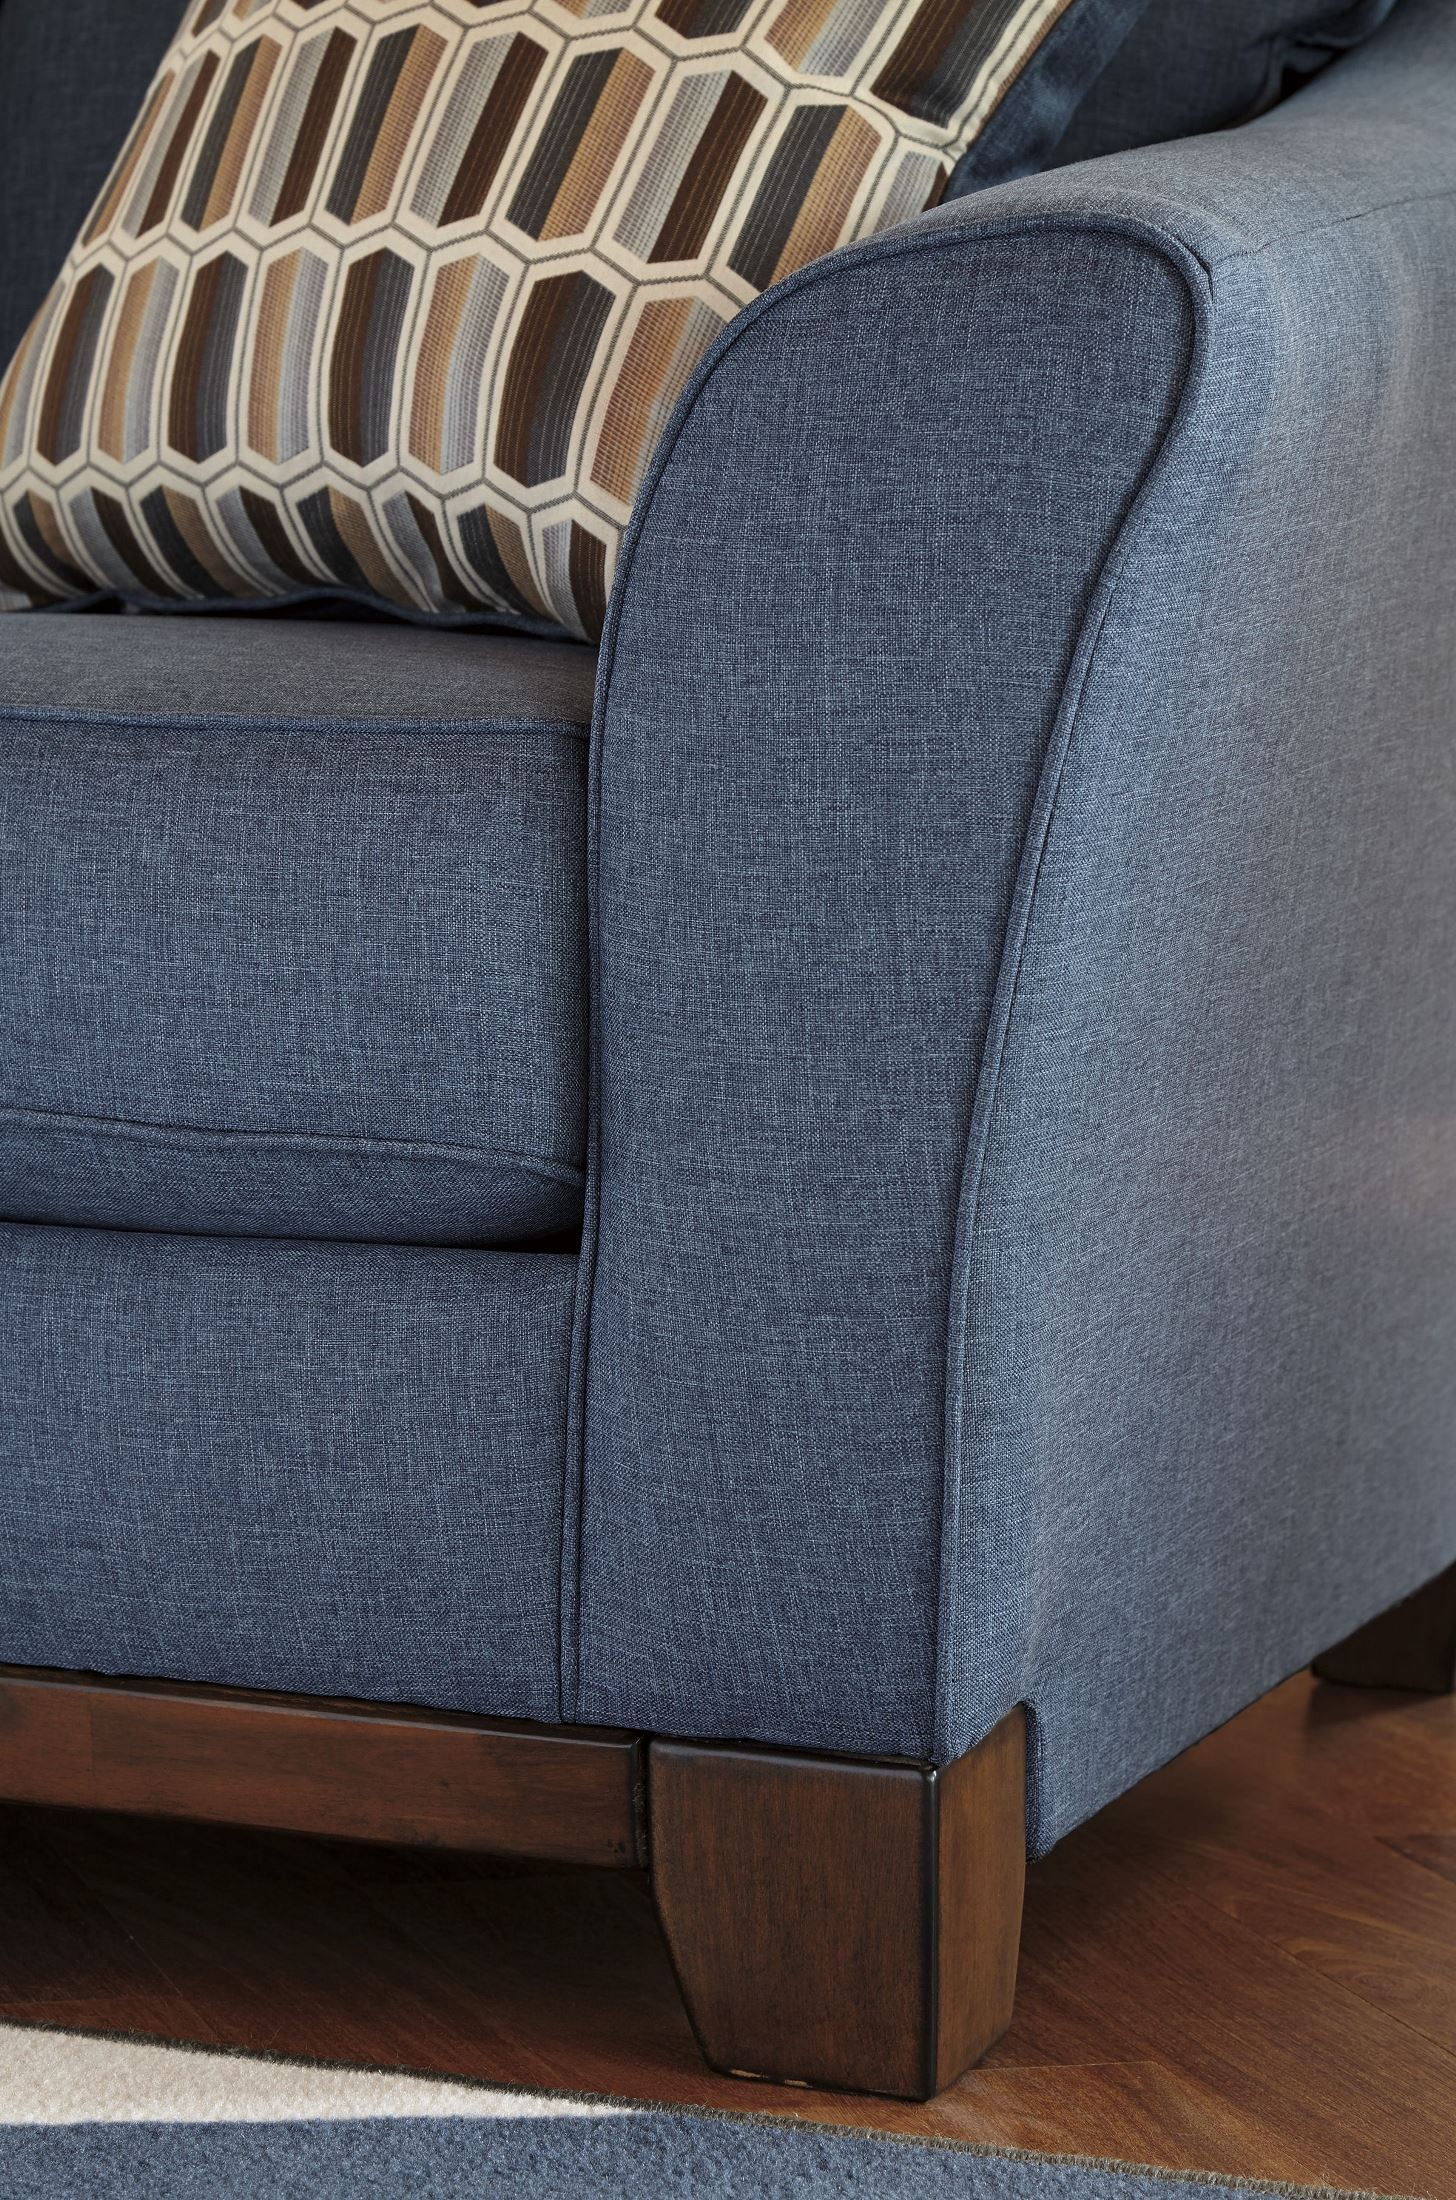 cloud sofa for sale cover maker makati janley denim from ashley | coleman furniture